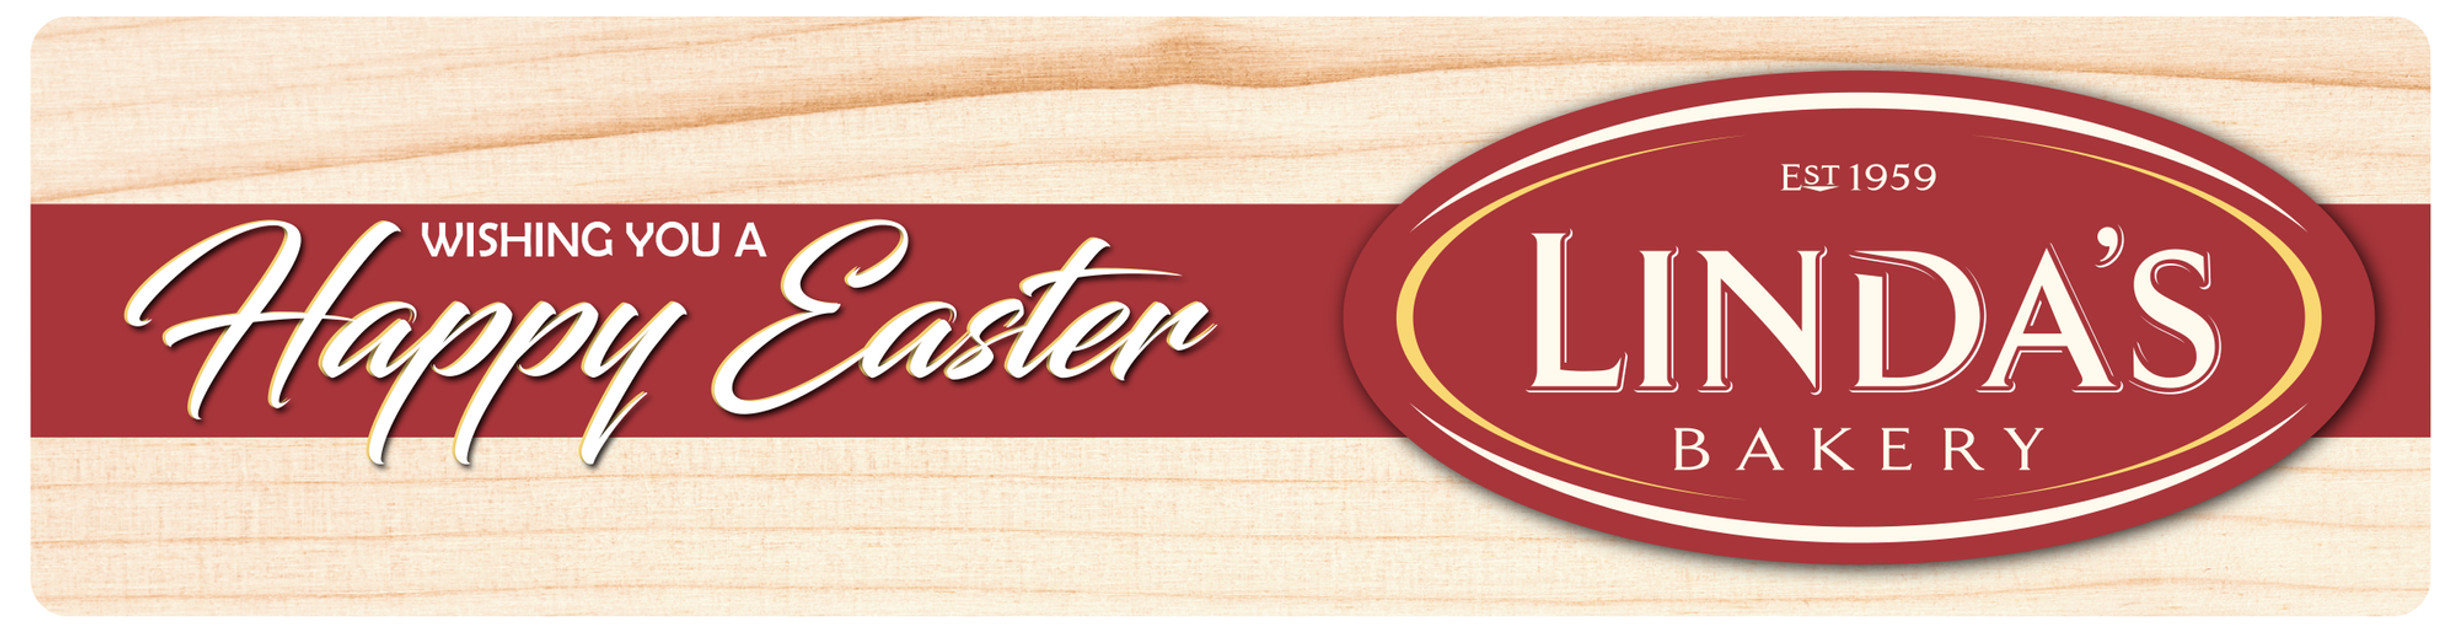 Linda's Bakery (Happy Easter) - Flexo Label